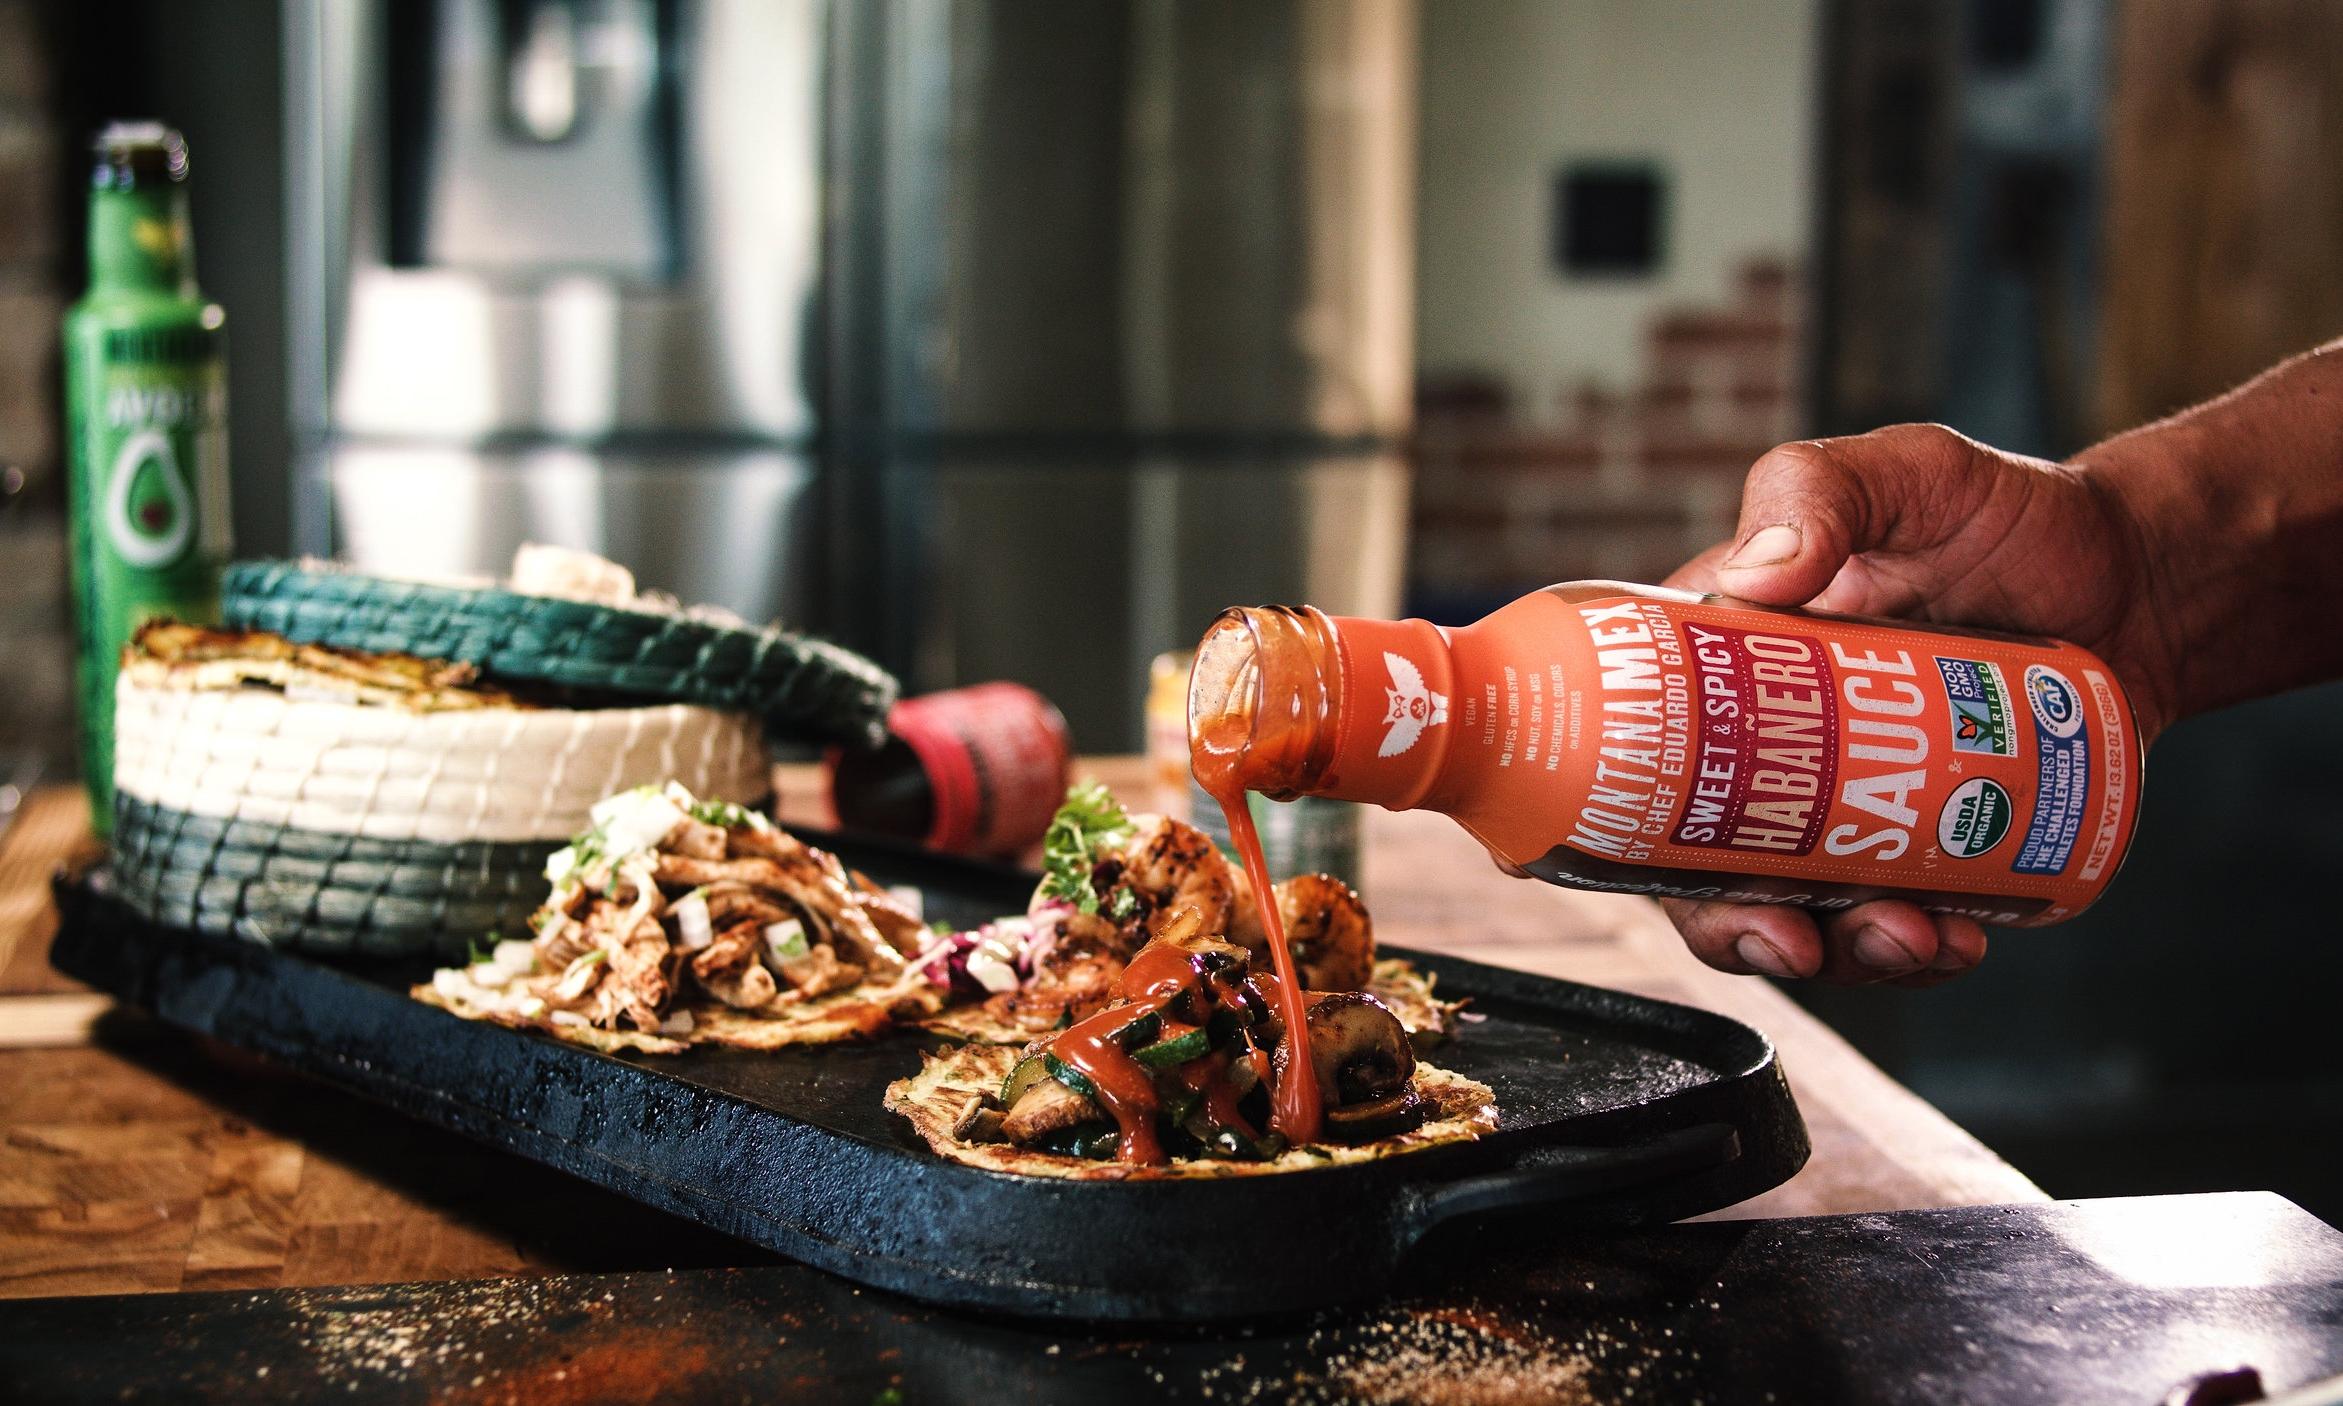 ketchup, BBQ and Habanero sauce deliciousness